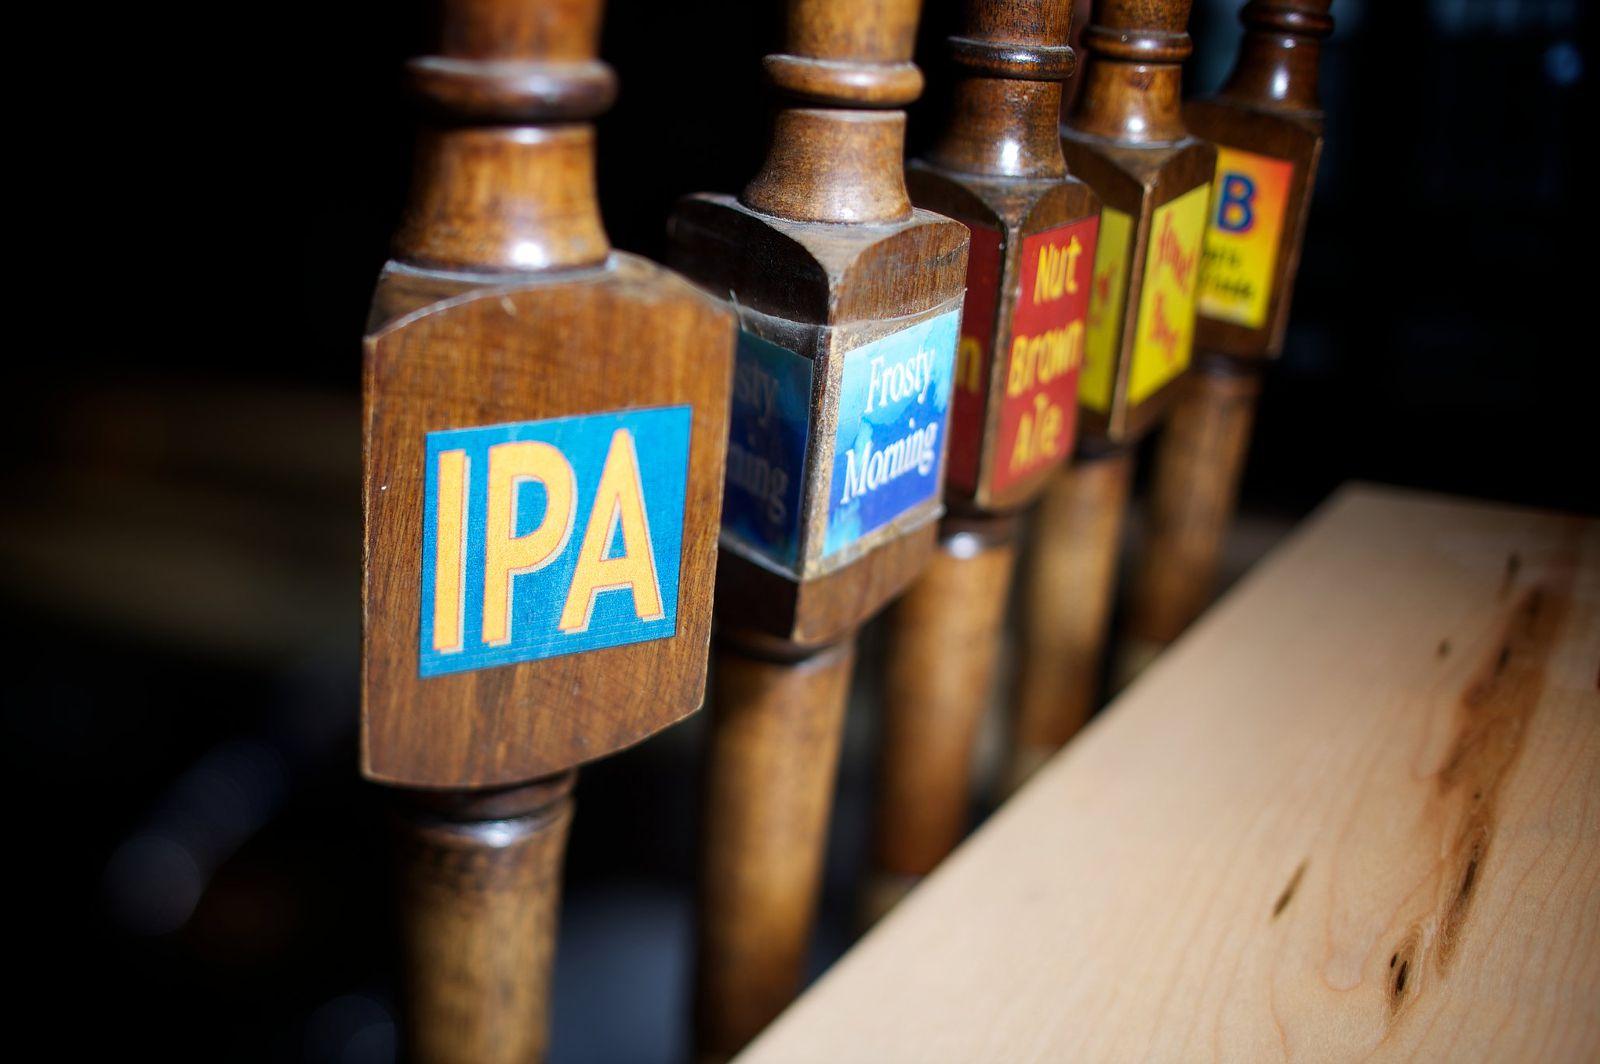 Montreal's hottest brewpubs include Brutopia.